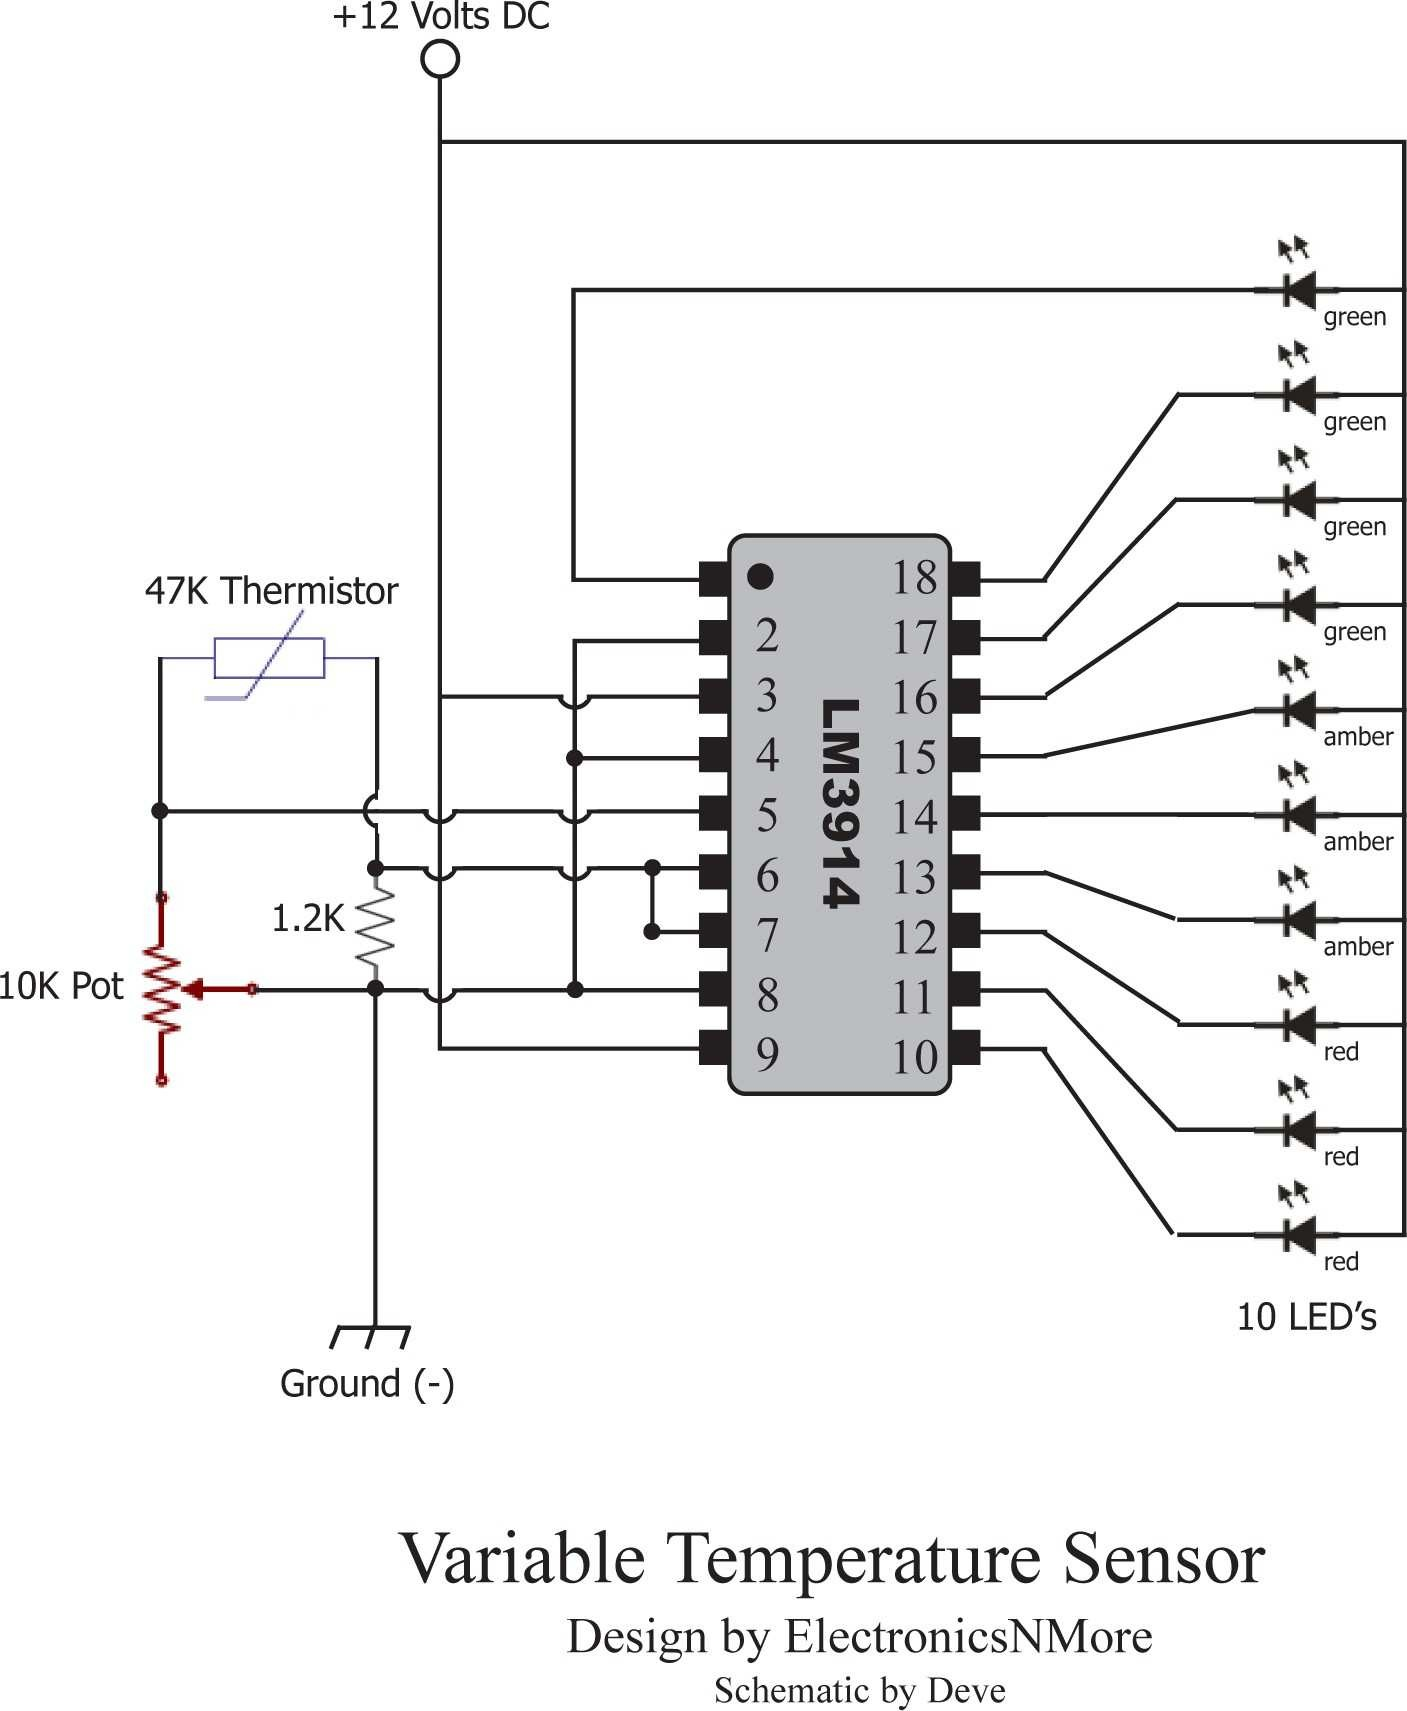 Potentiometer Circuit Diagram Inspirational Critical Systems Warning Circuit